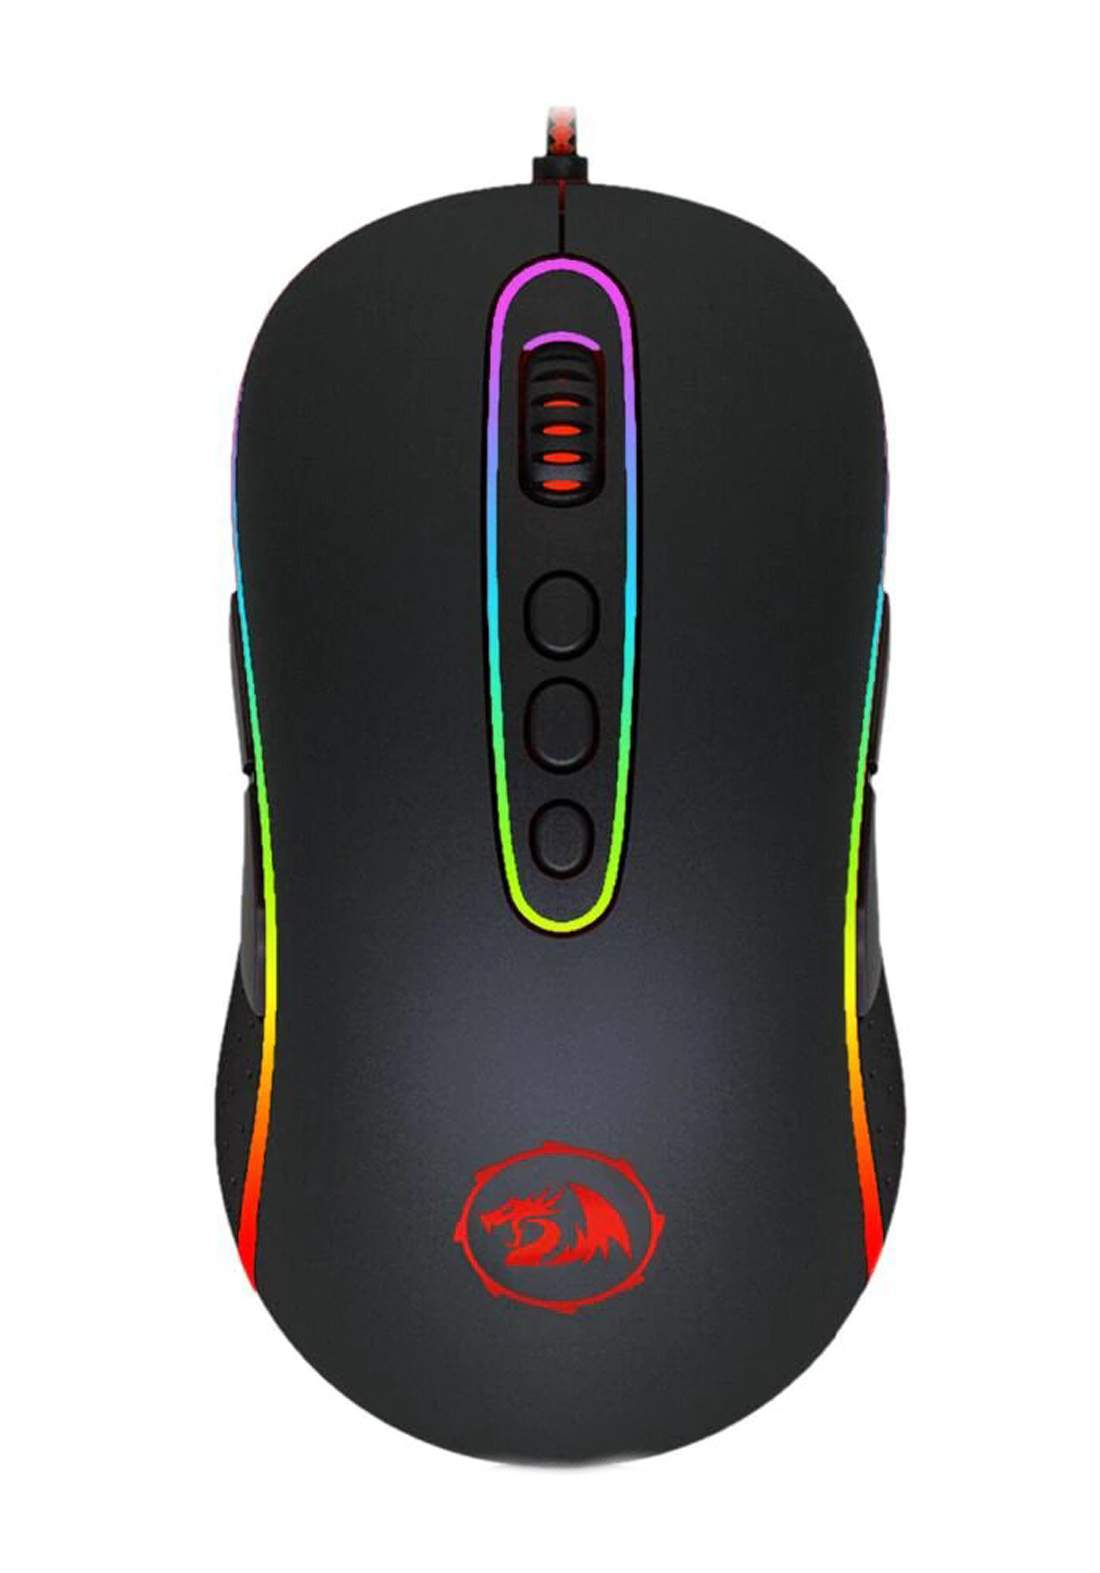 Redragon M702-2 RGB Gaming Mouse - Black ماوس